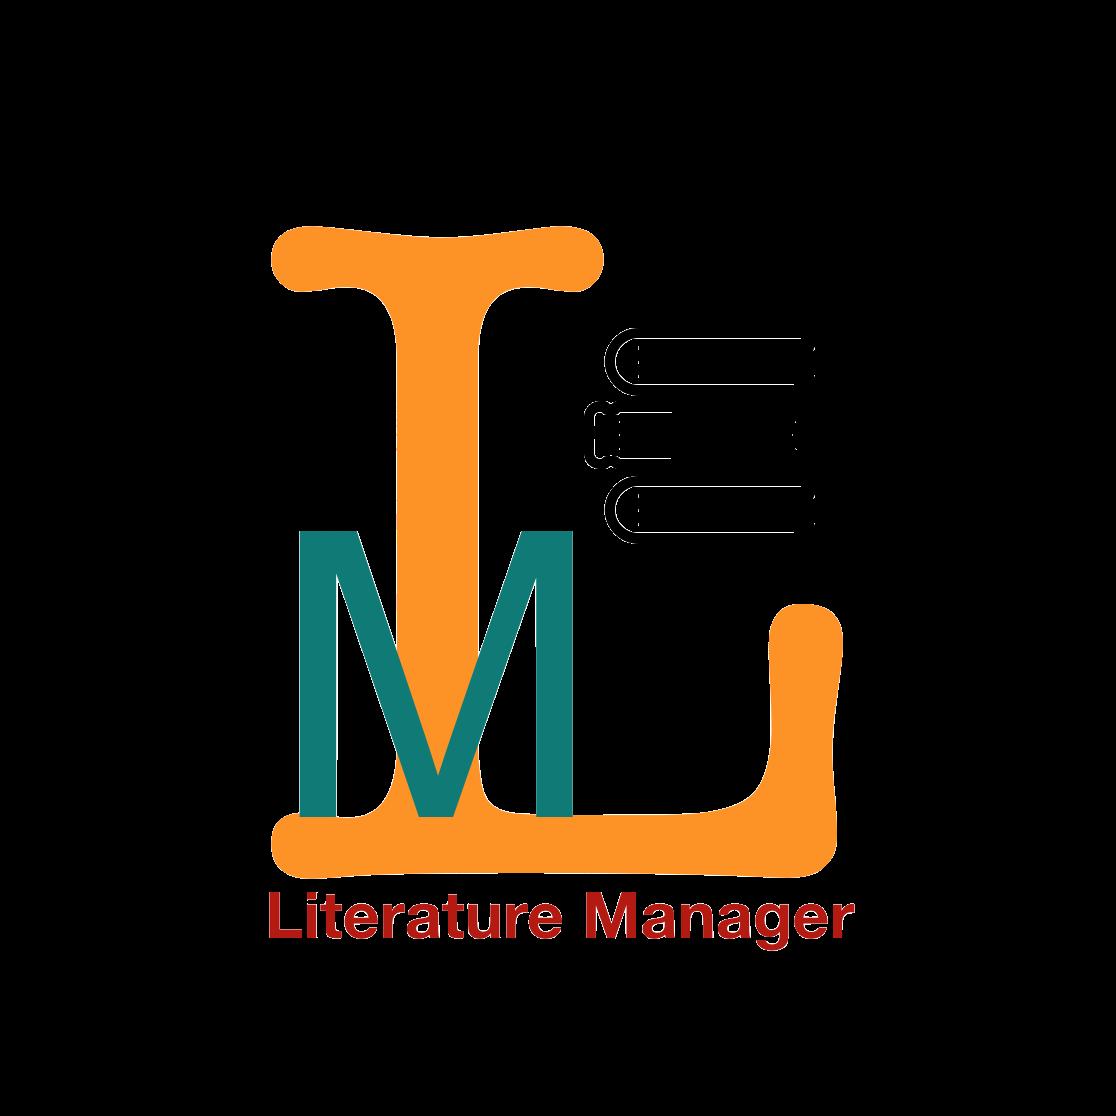 literature manager logo not found